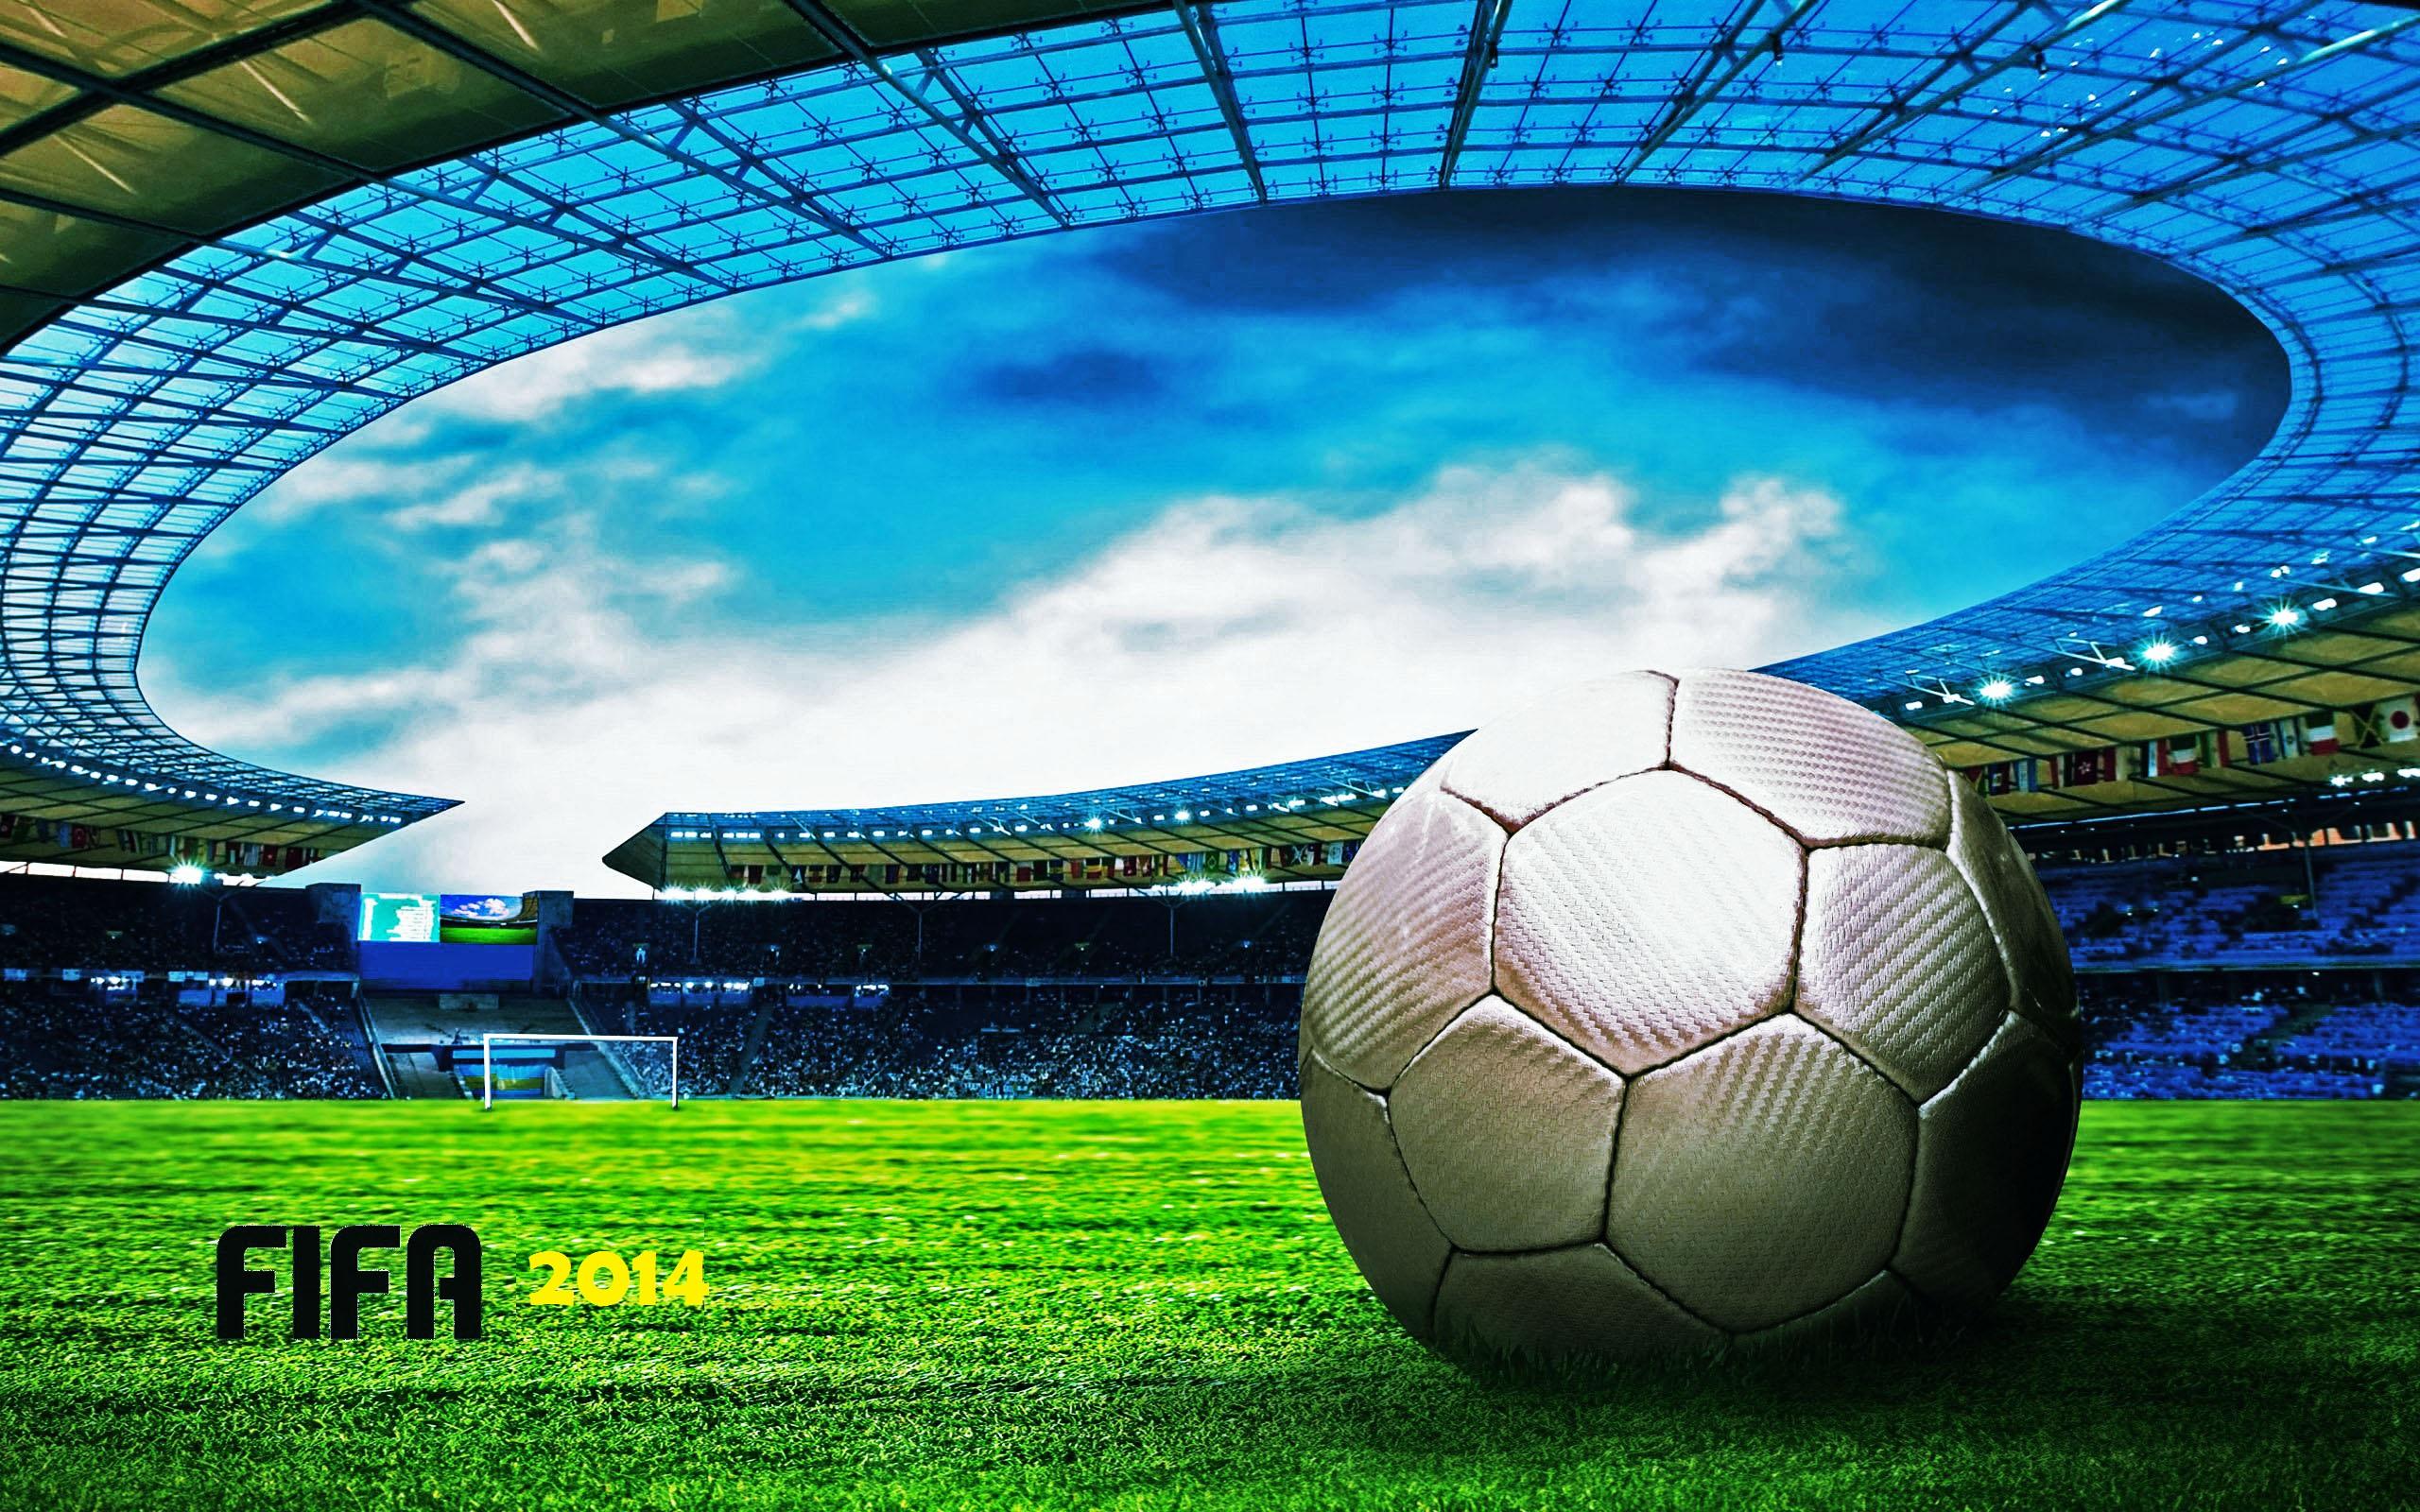 FIFA HD Wallpapers | Hd Wallpapers